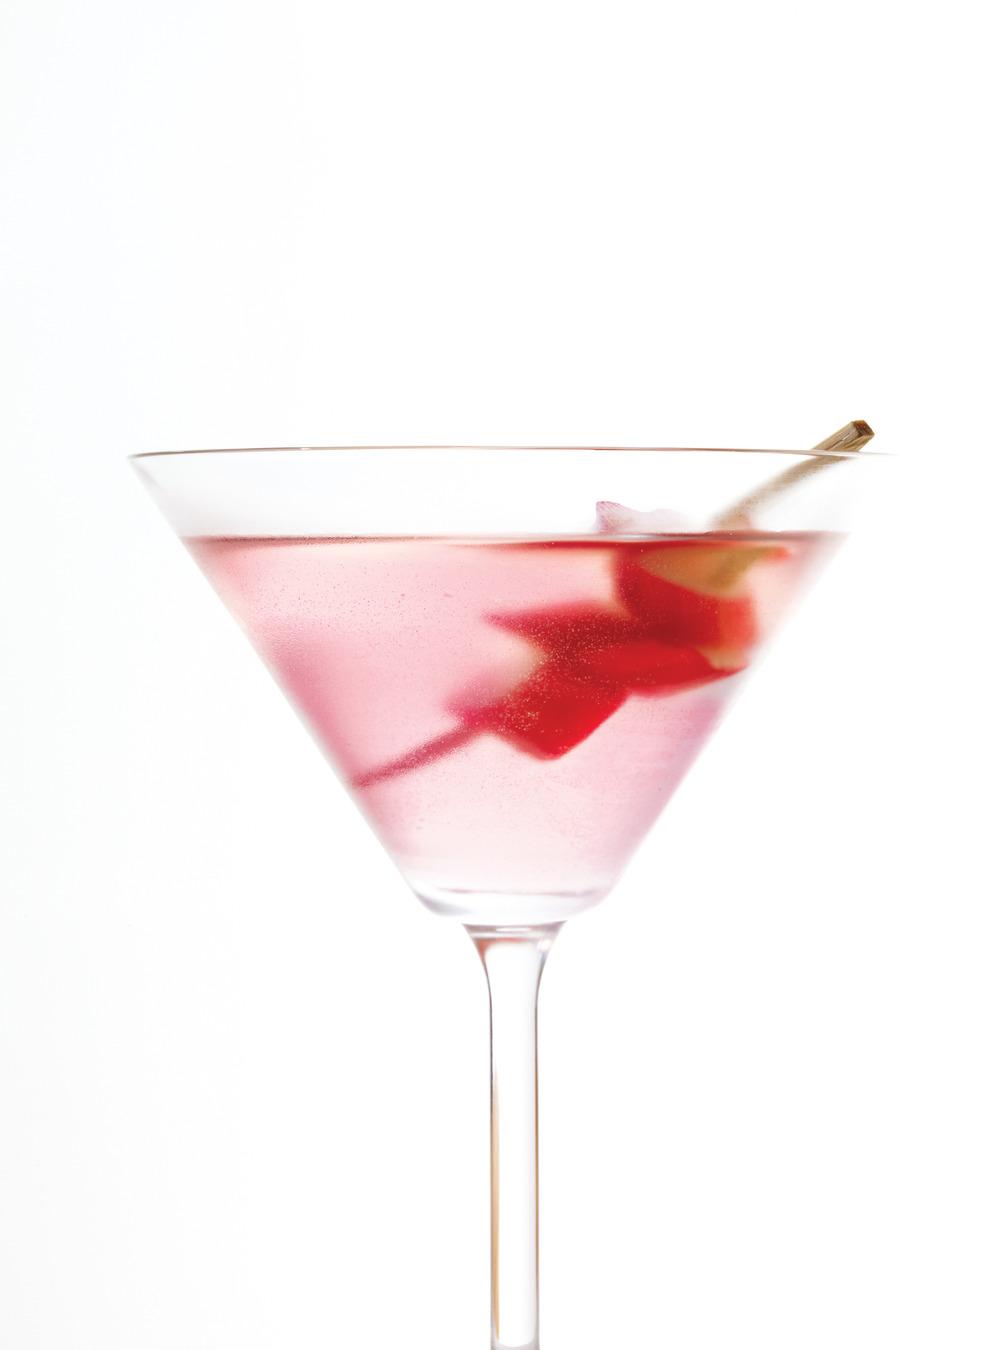 Cosmopolitain à la rhubarbe | ricardo